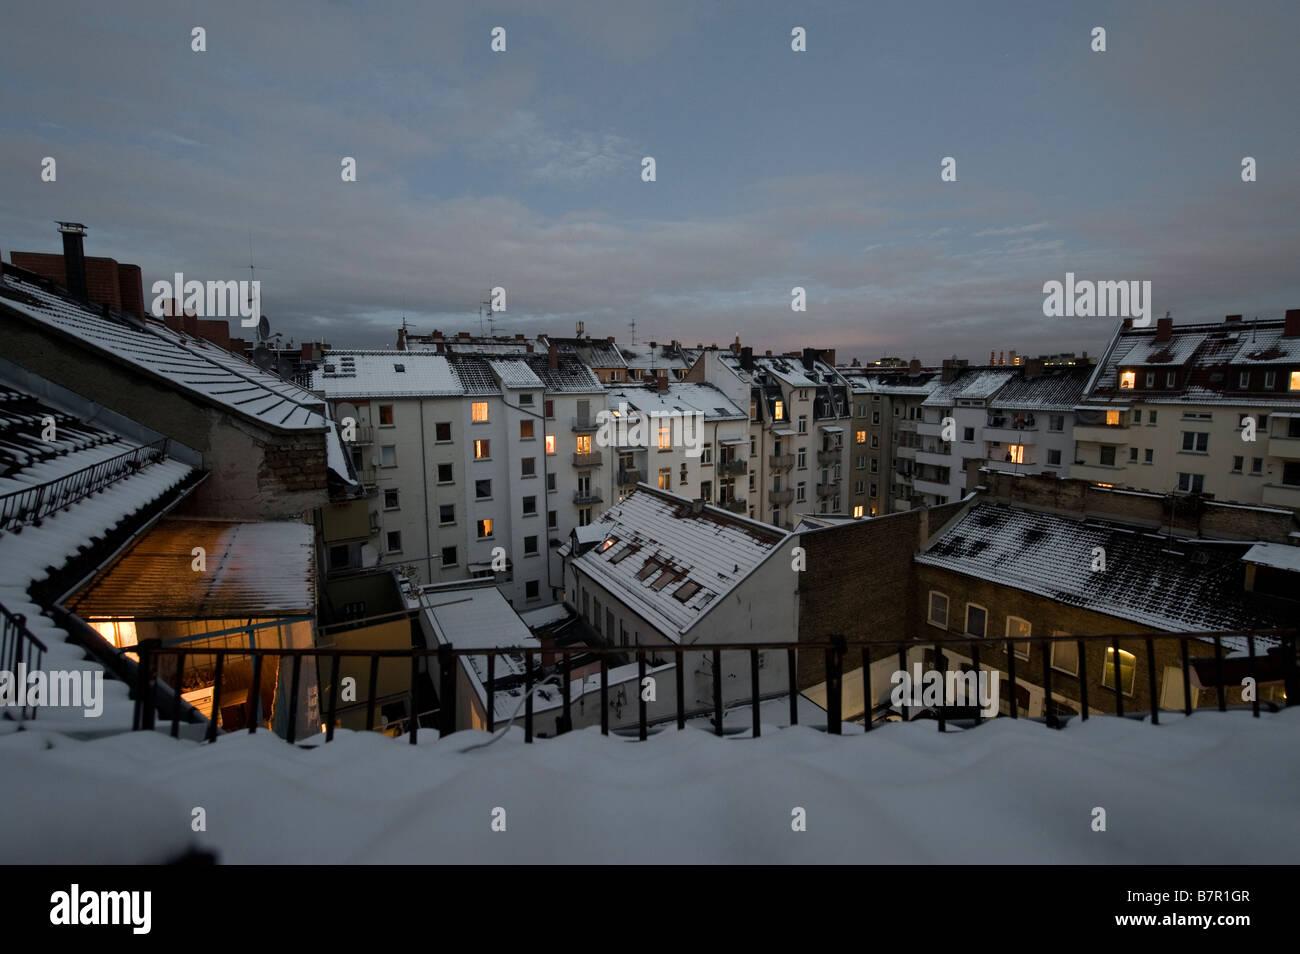 Deep winter backyard scenery - Stock Image